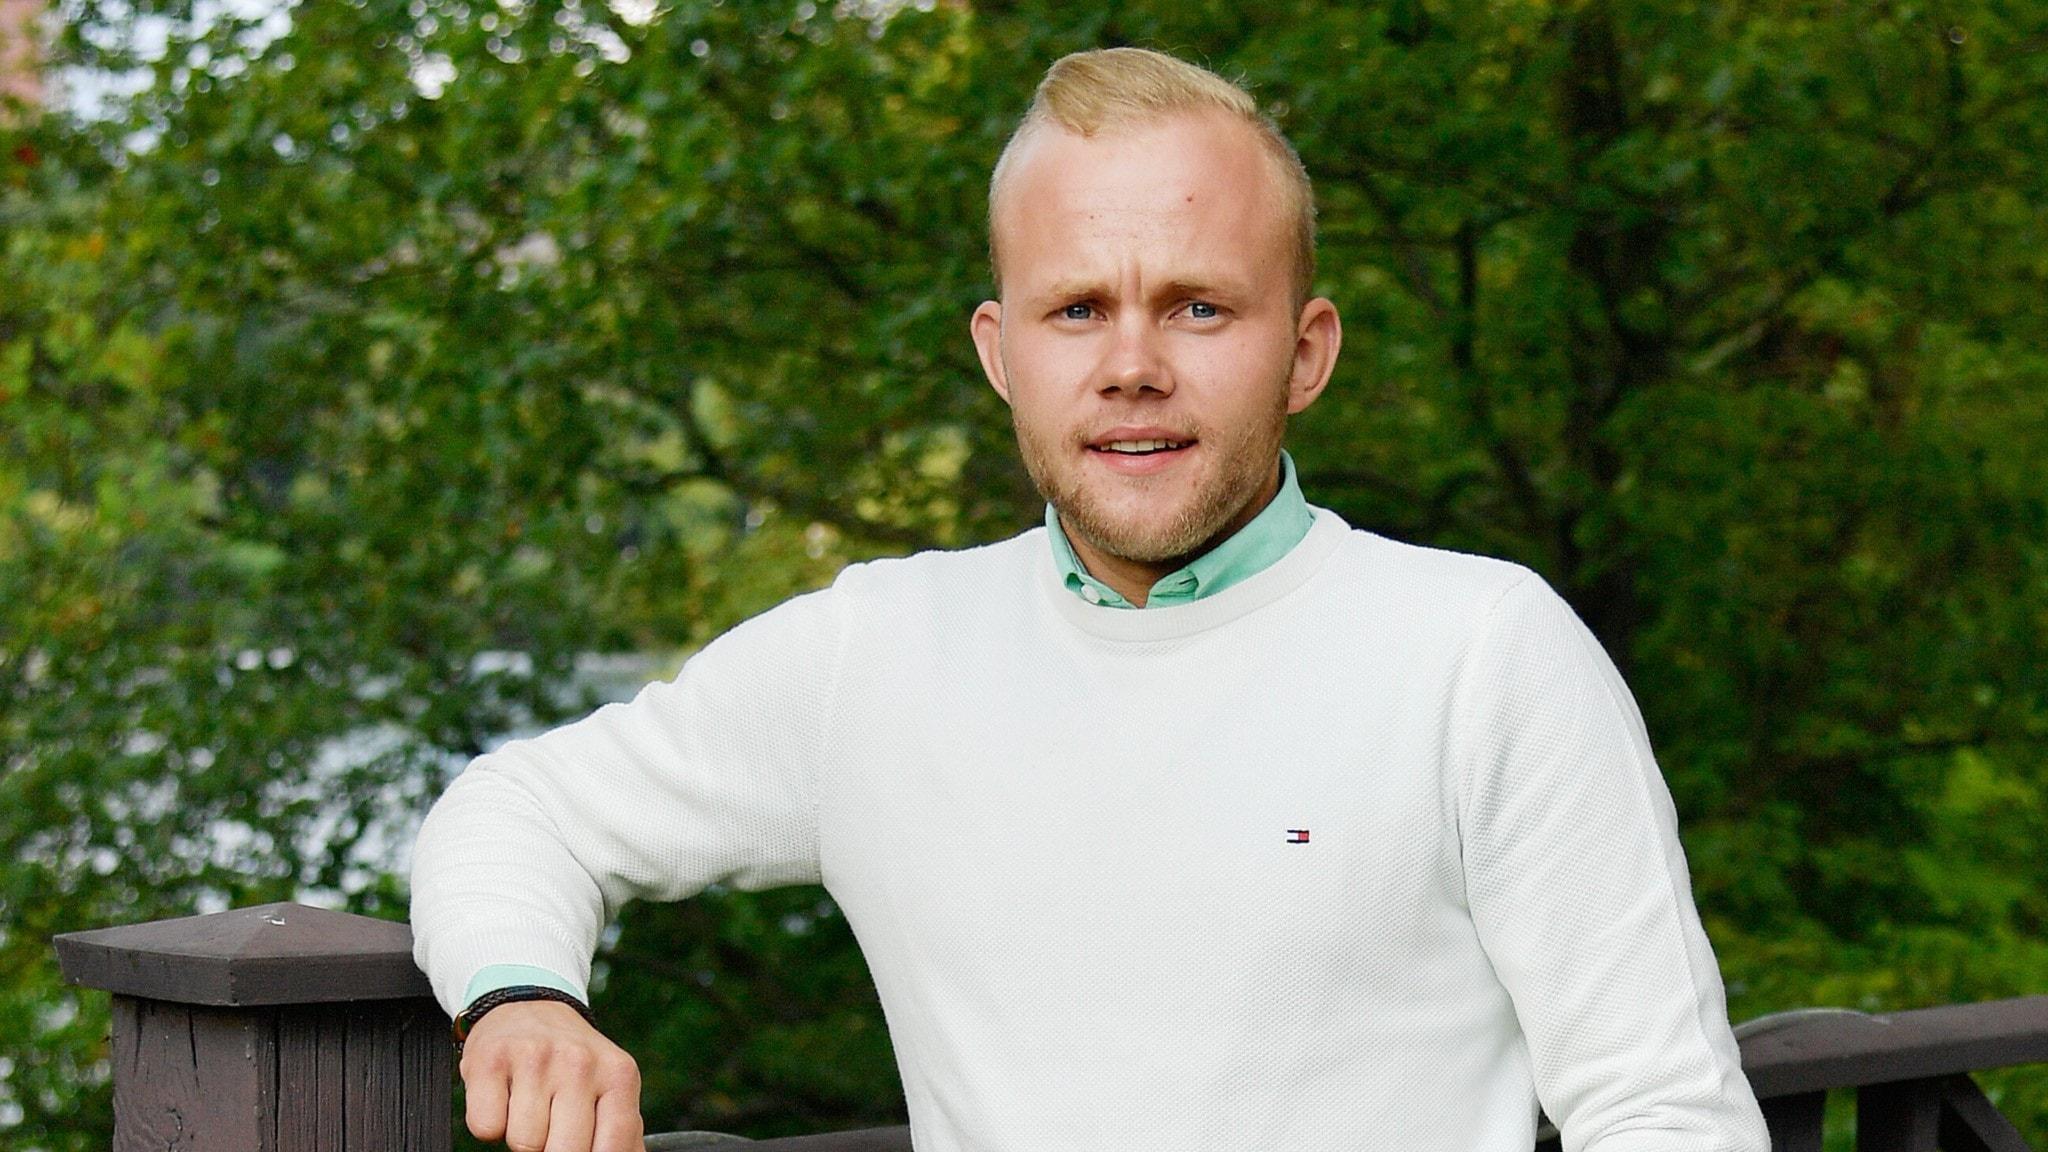 Kille sker par Sverige Kronobergs ln - BodyContact